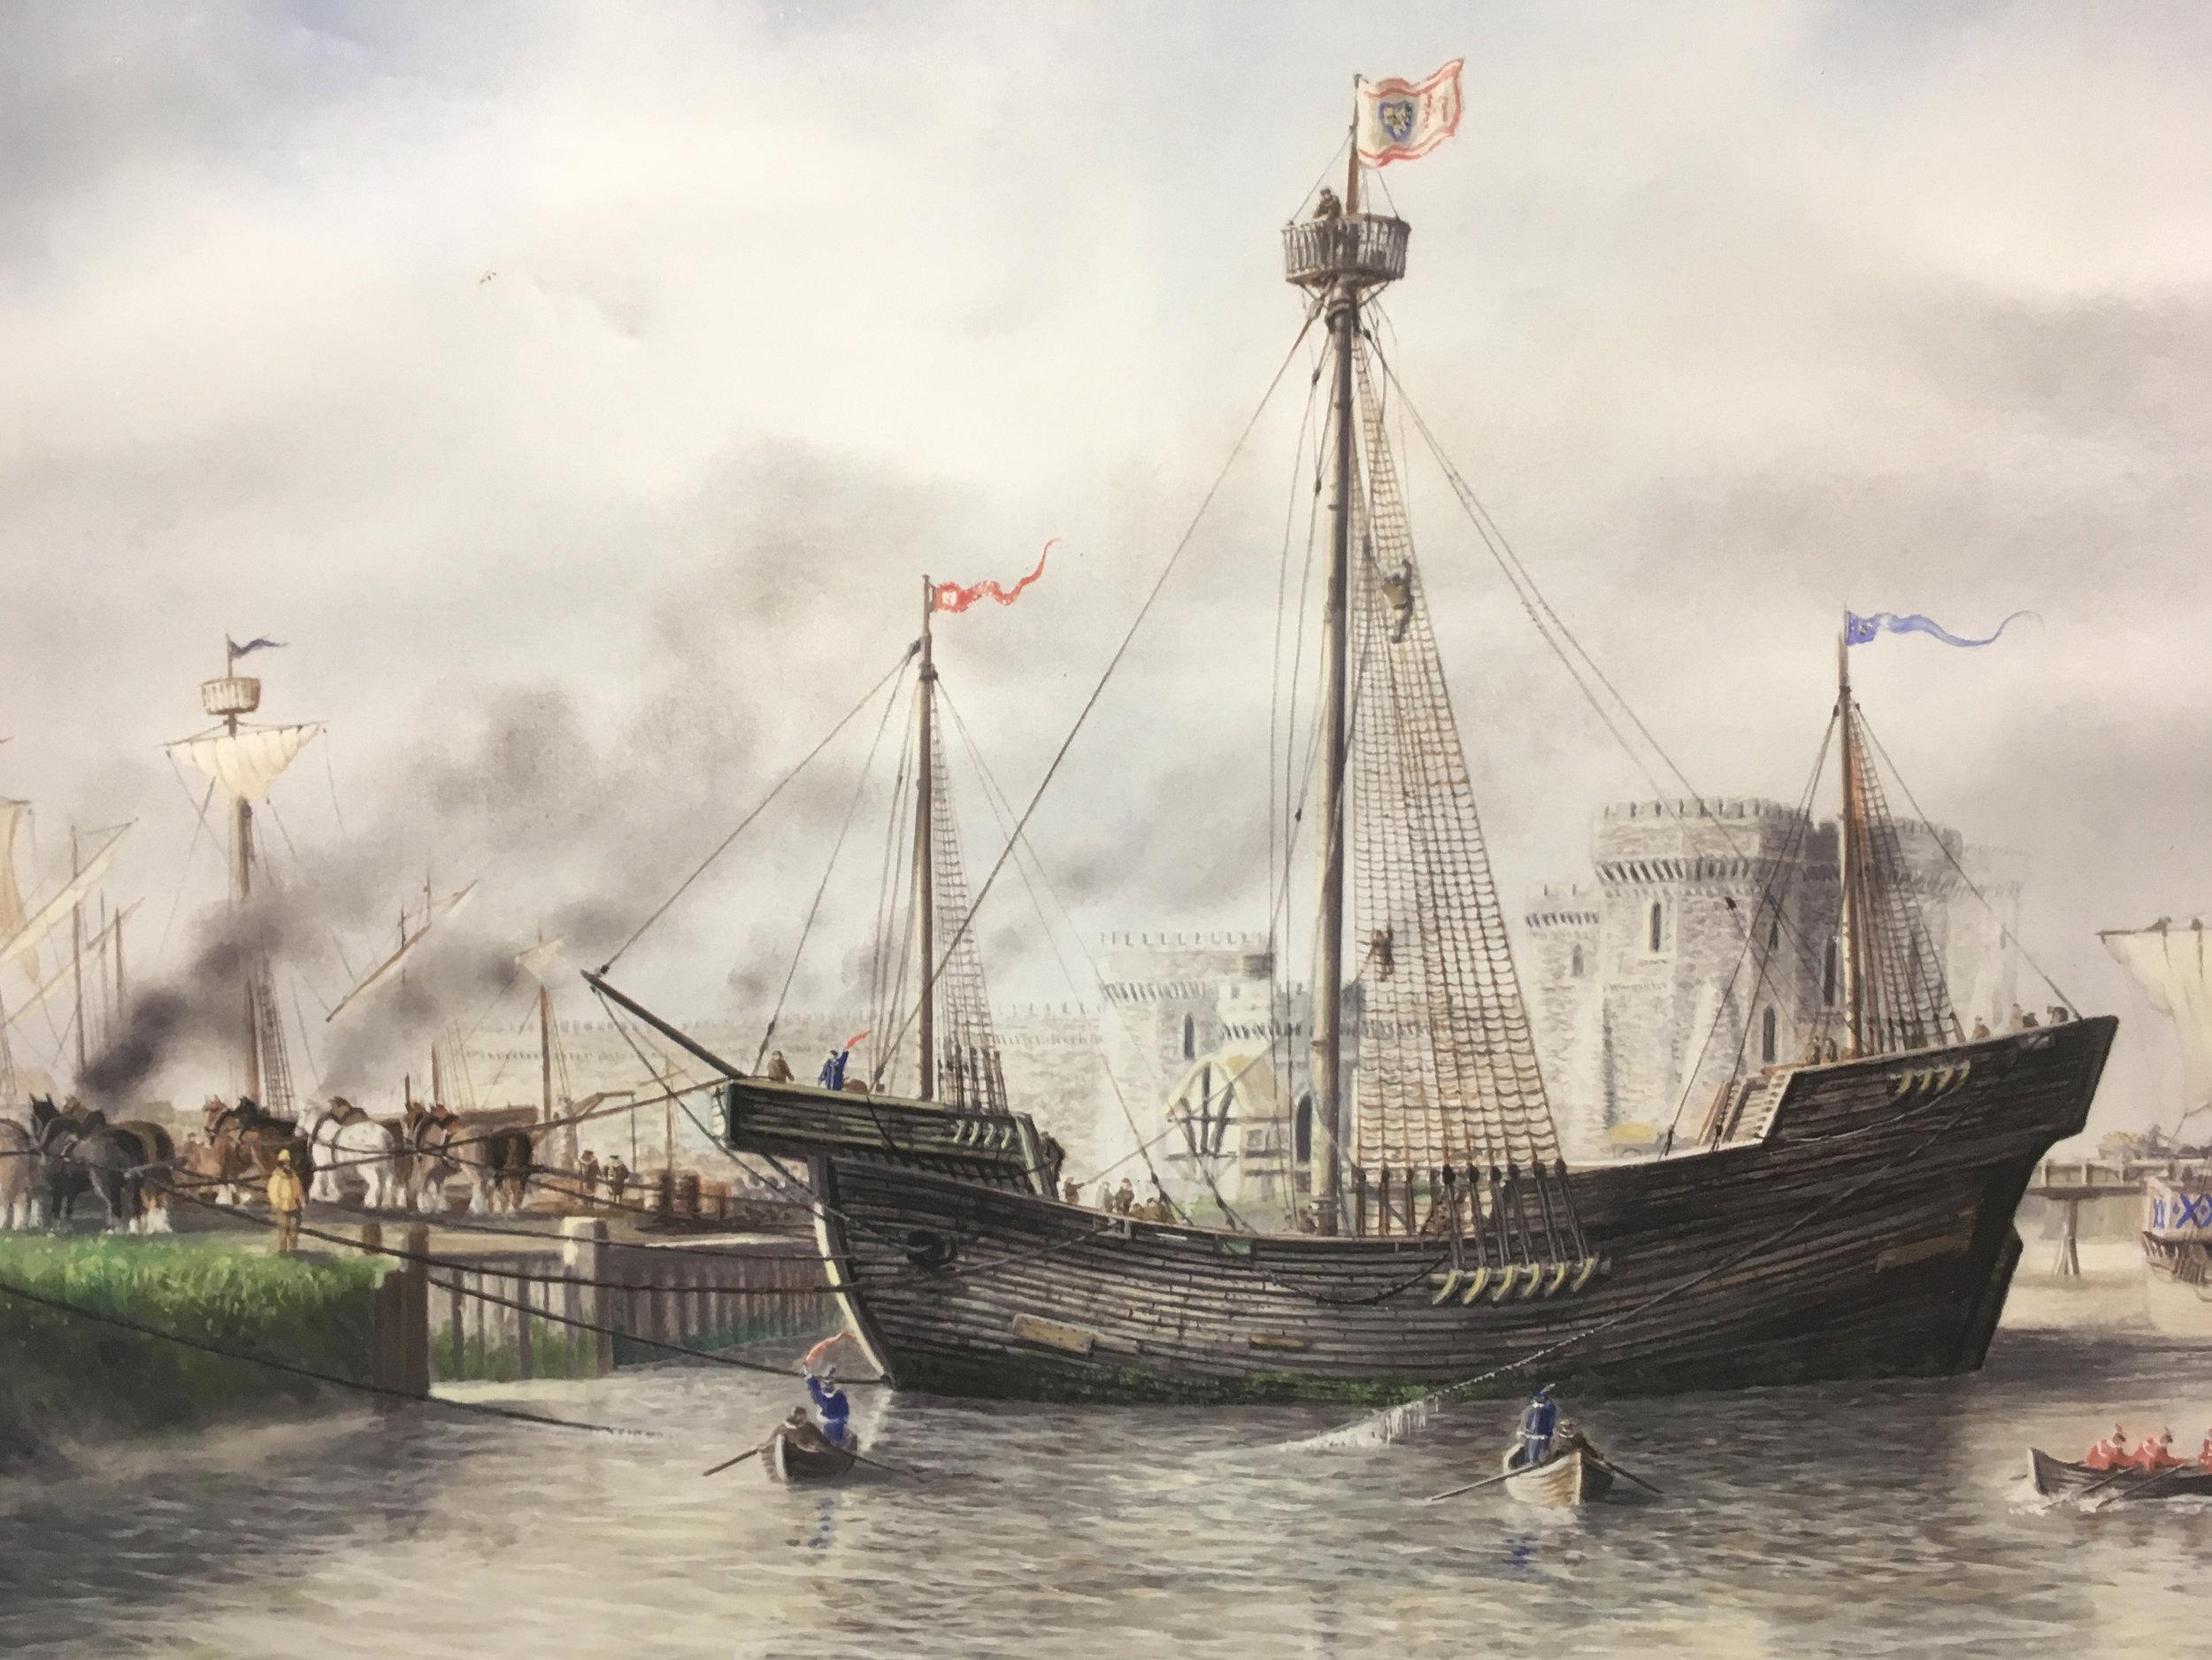 Artists reconstruction of the Newport Ship (David Jordan/Newport Museum & Art Gallery)